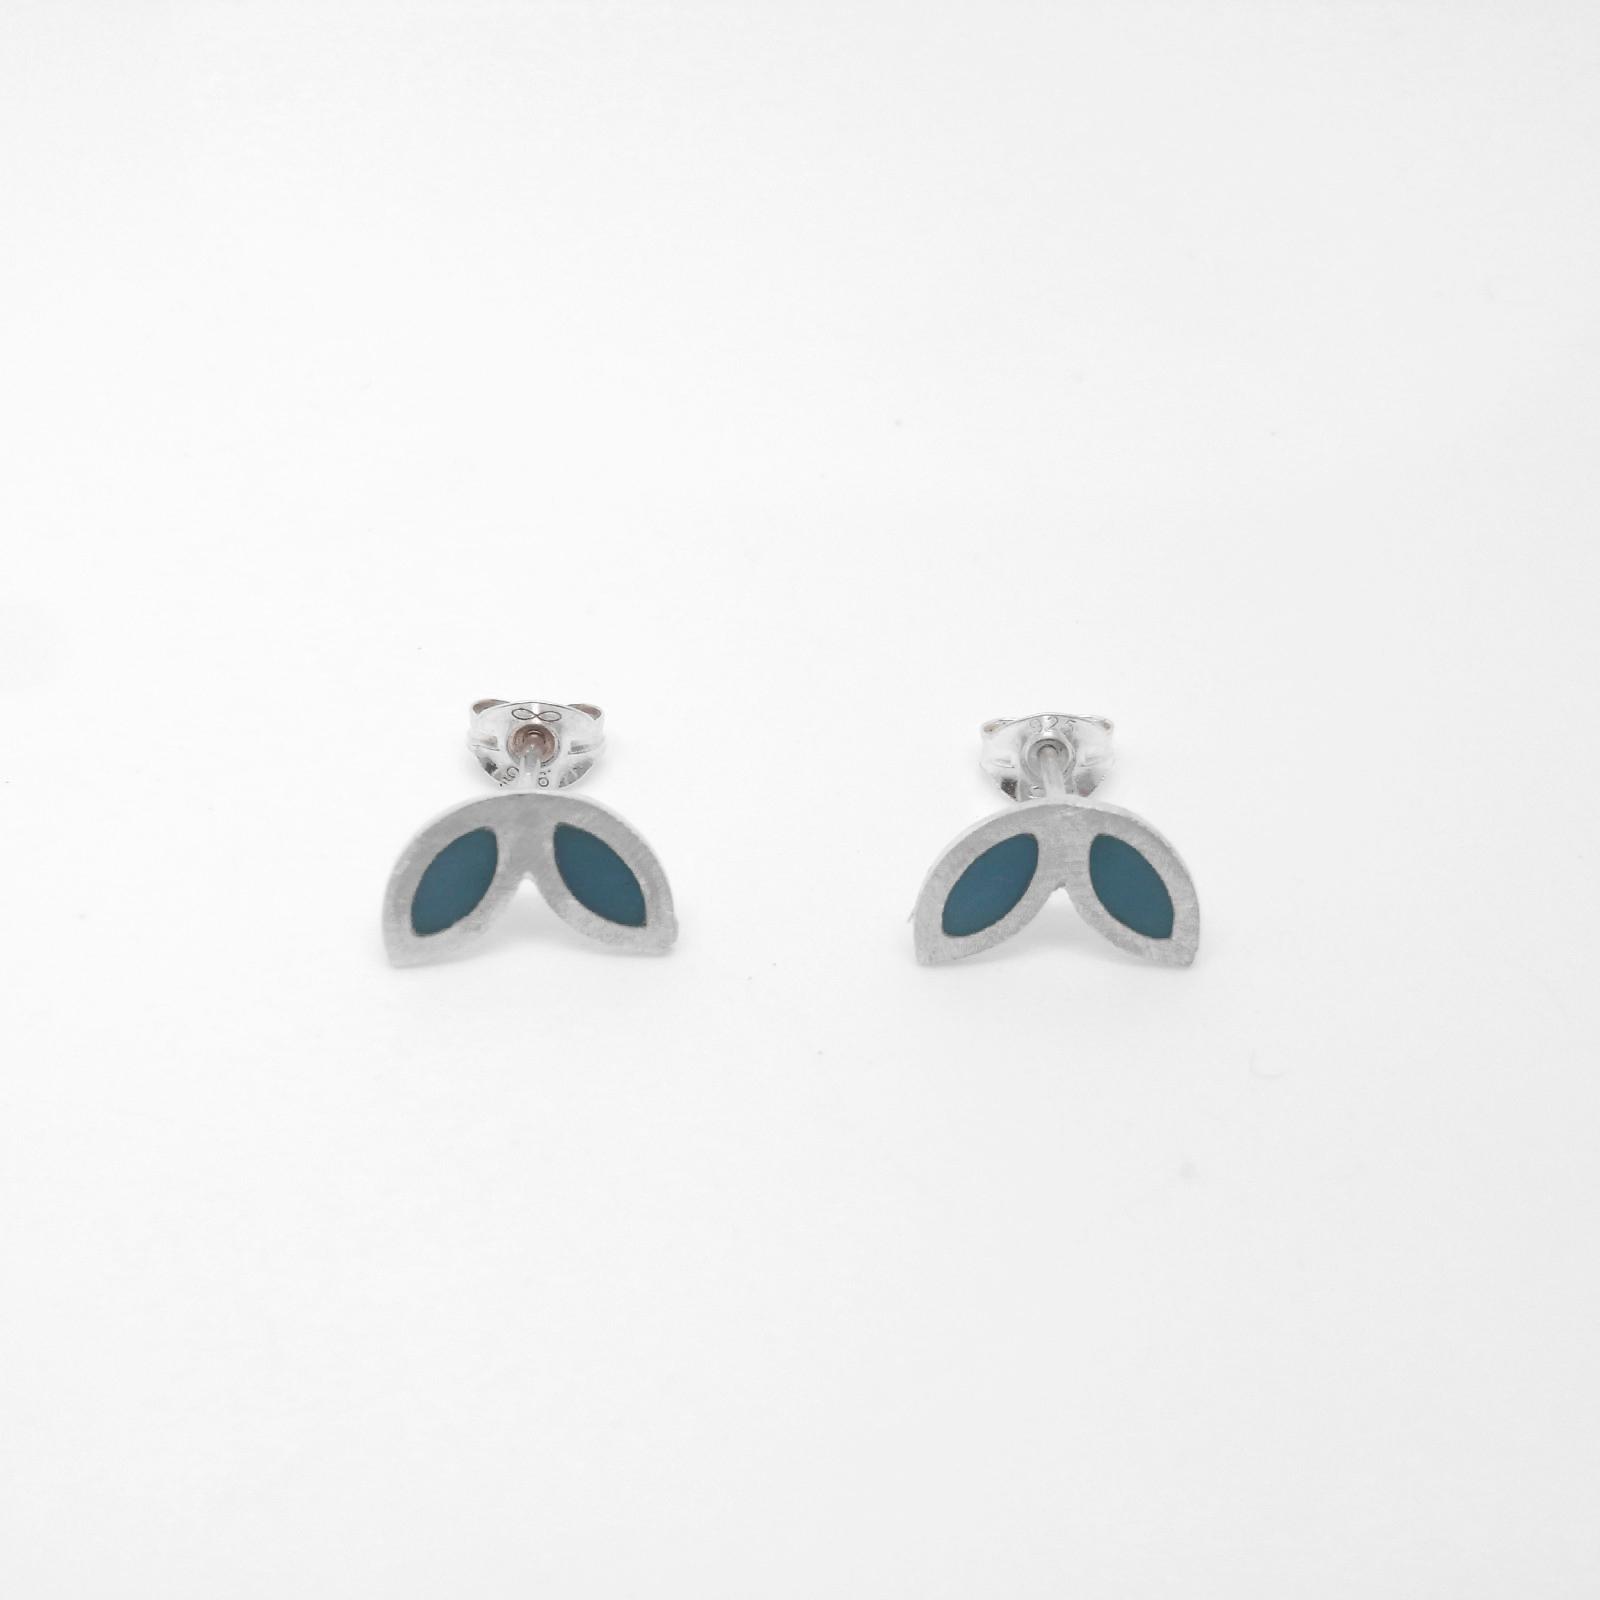 SALE - Silver Petal Studs - Ocean Blue